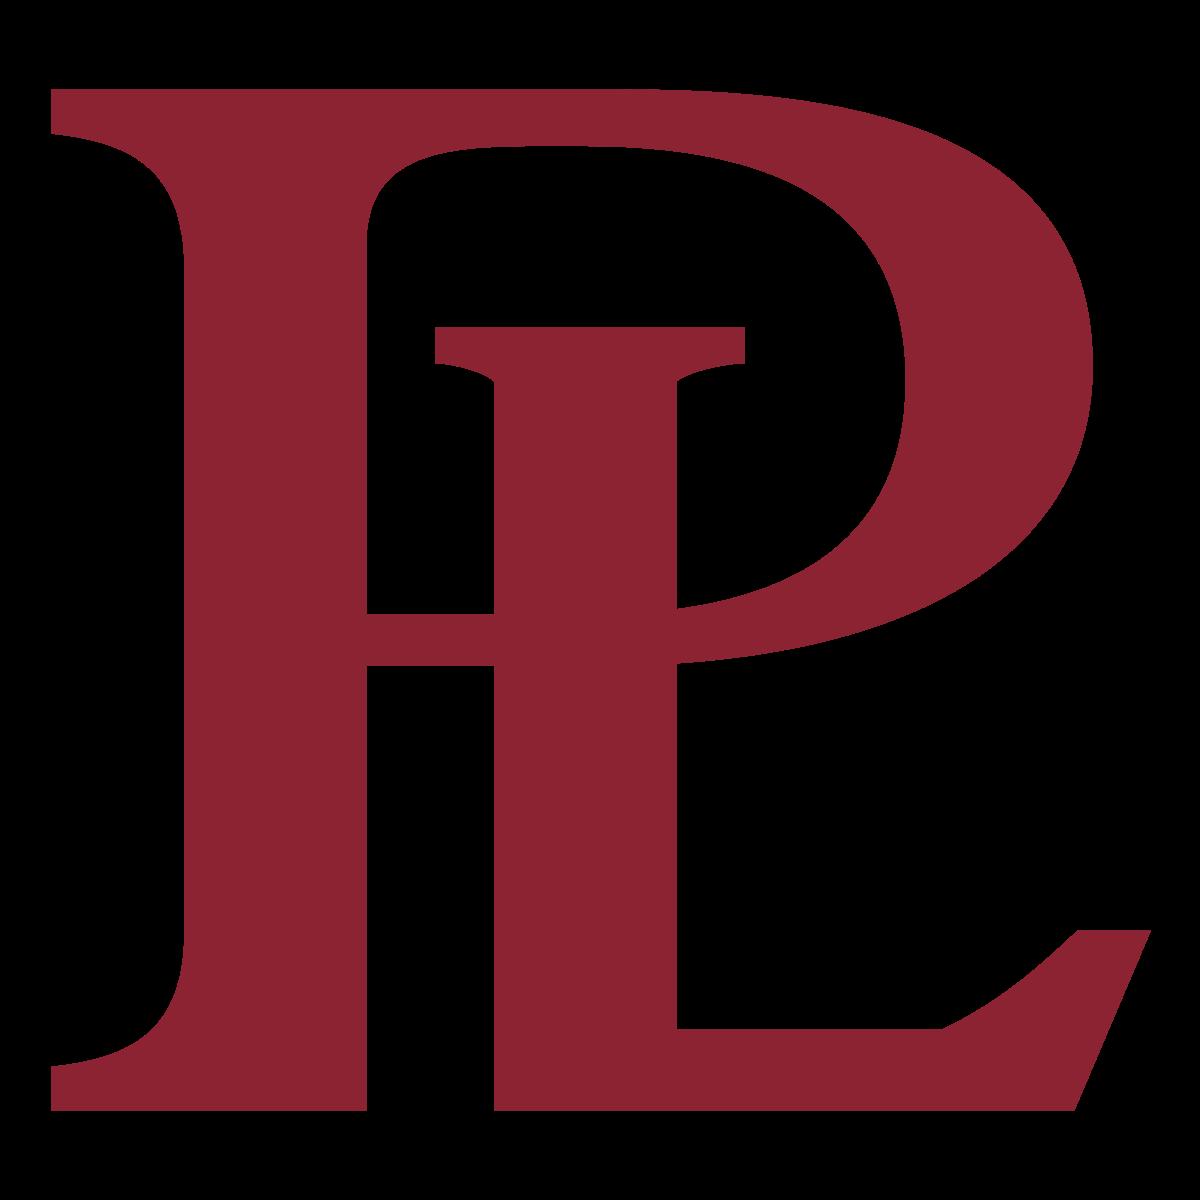 High school mascot clipart clip art royalty free stock Papillion-La Vista Senior High School - Wikipedia clip art royalty free stock